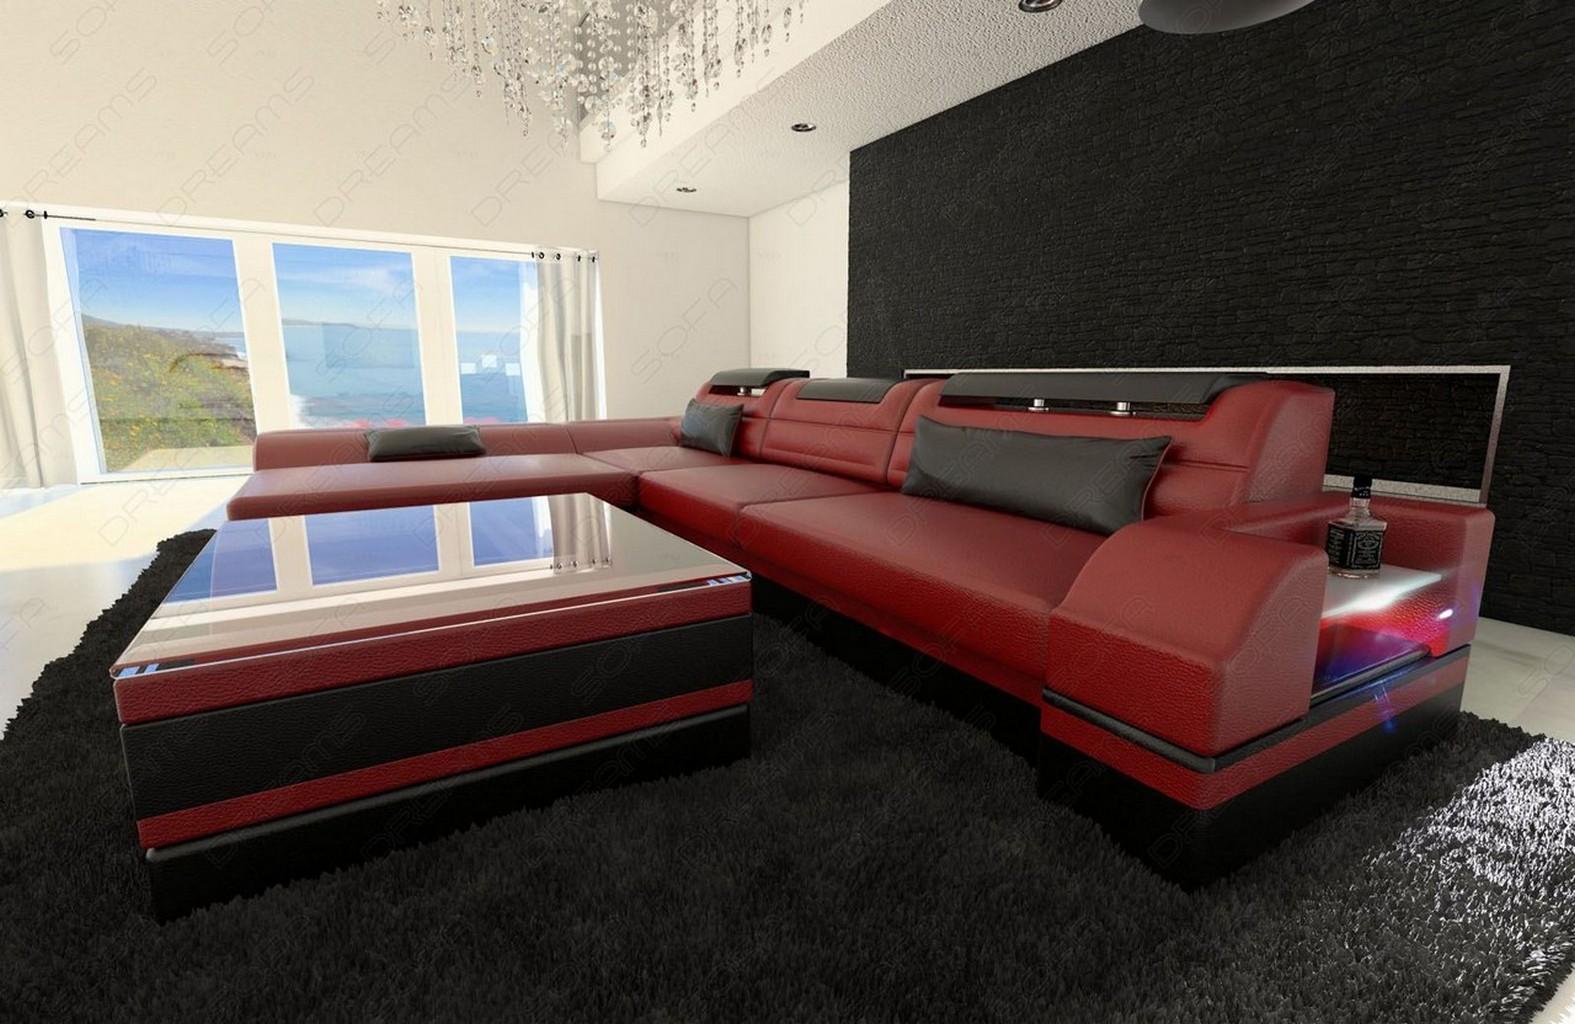 ledersofa monza l form design ledercouch luxussofa recamiere und led beleuchtung ebay. Black Bedroom Furniture Sets. Home Design Ideas